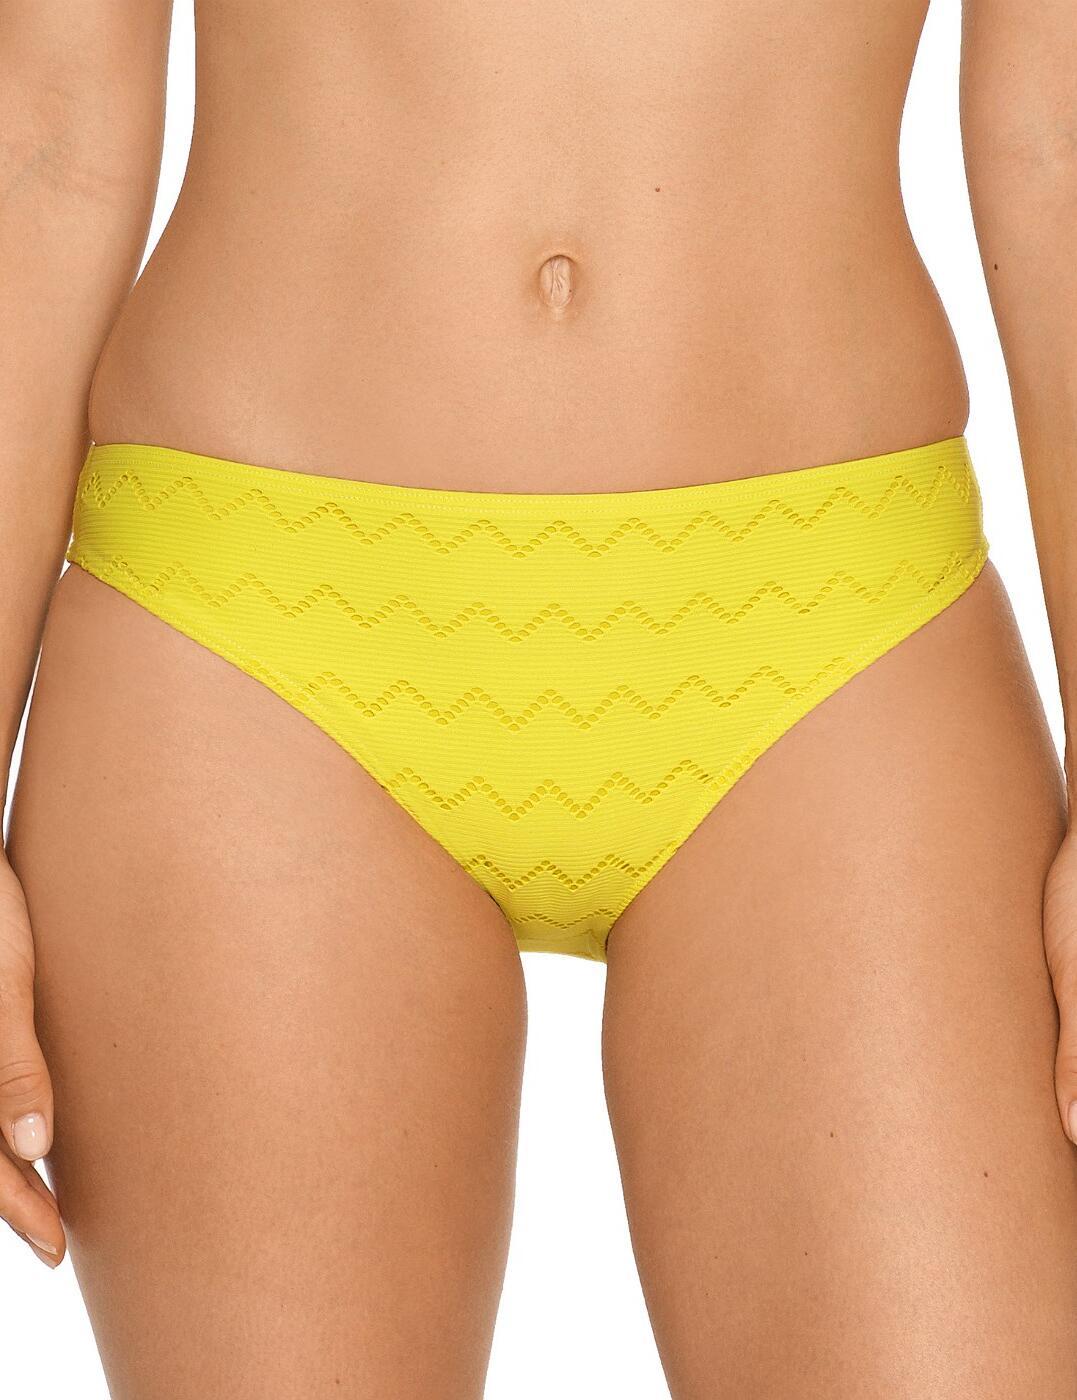 4004350 Prima Donna Maya Rio Bikini Brief - 4004350 Canary